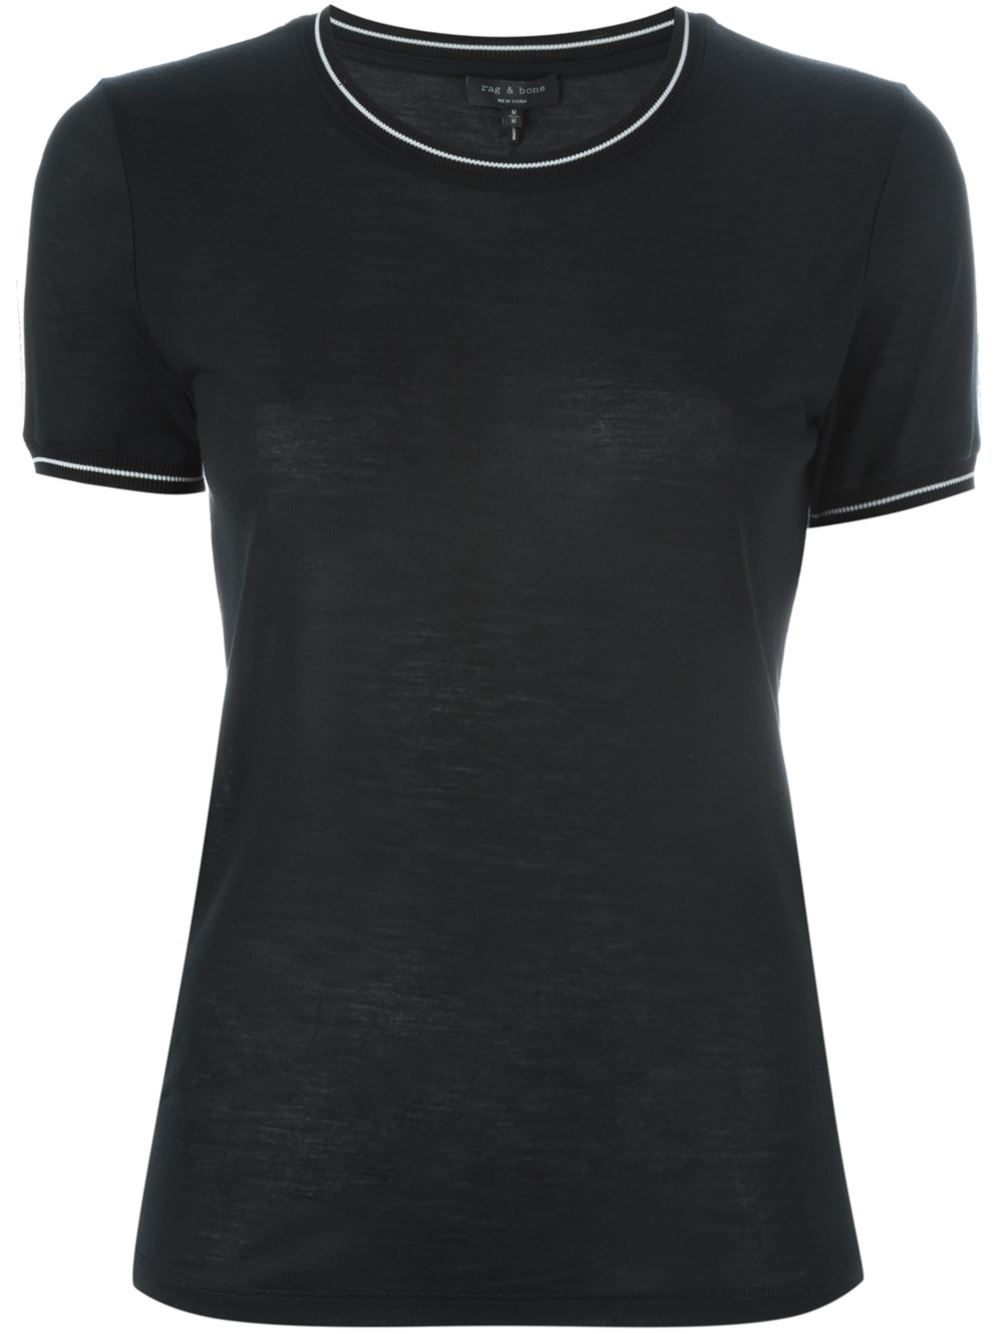 Rag bone contrast trim t shirt in black lyst for Rag and bone t shirts